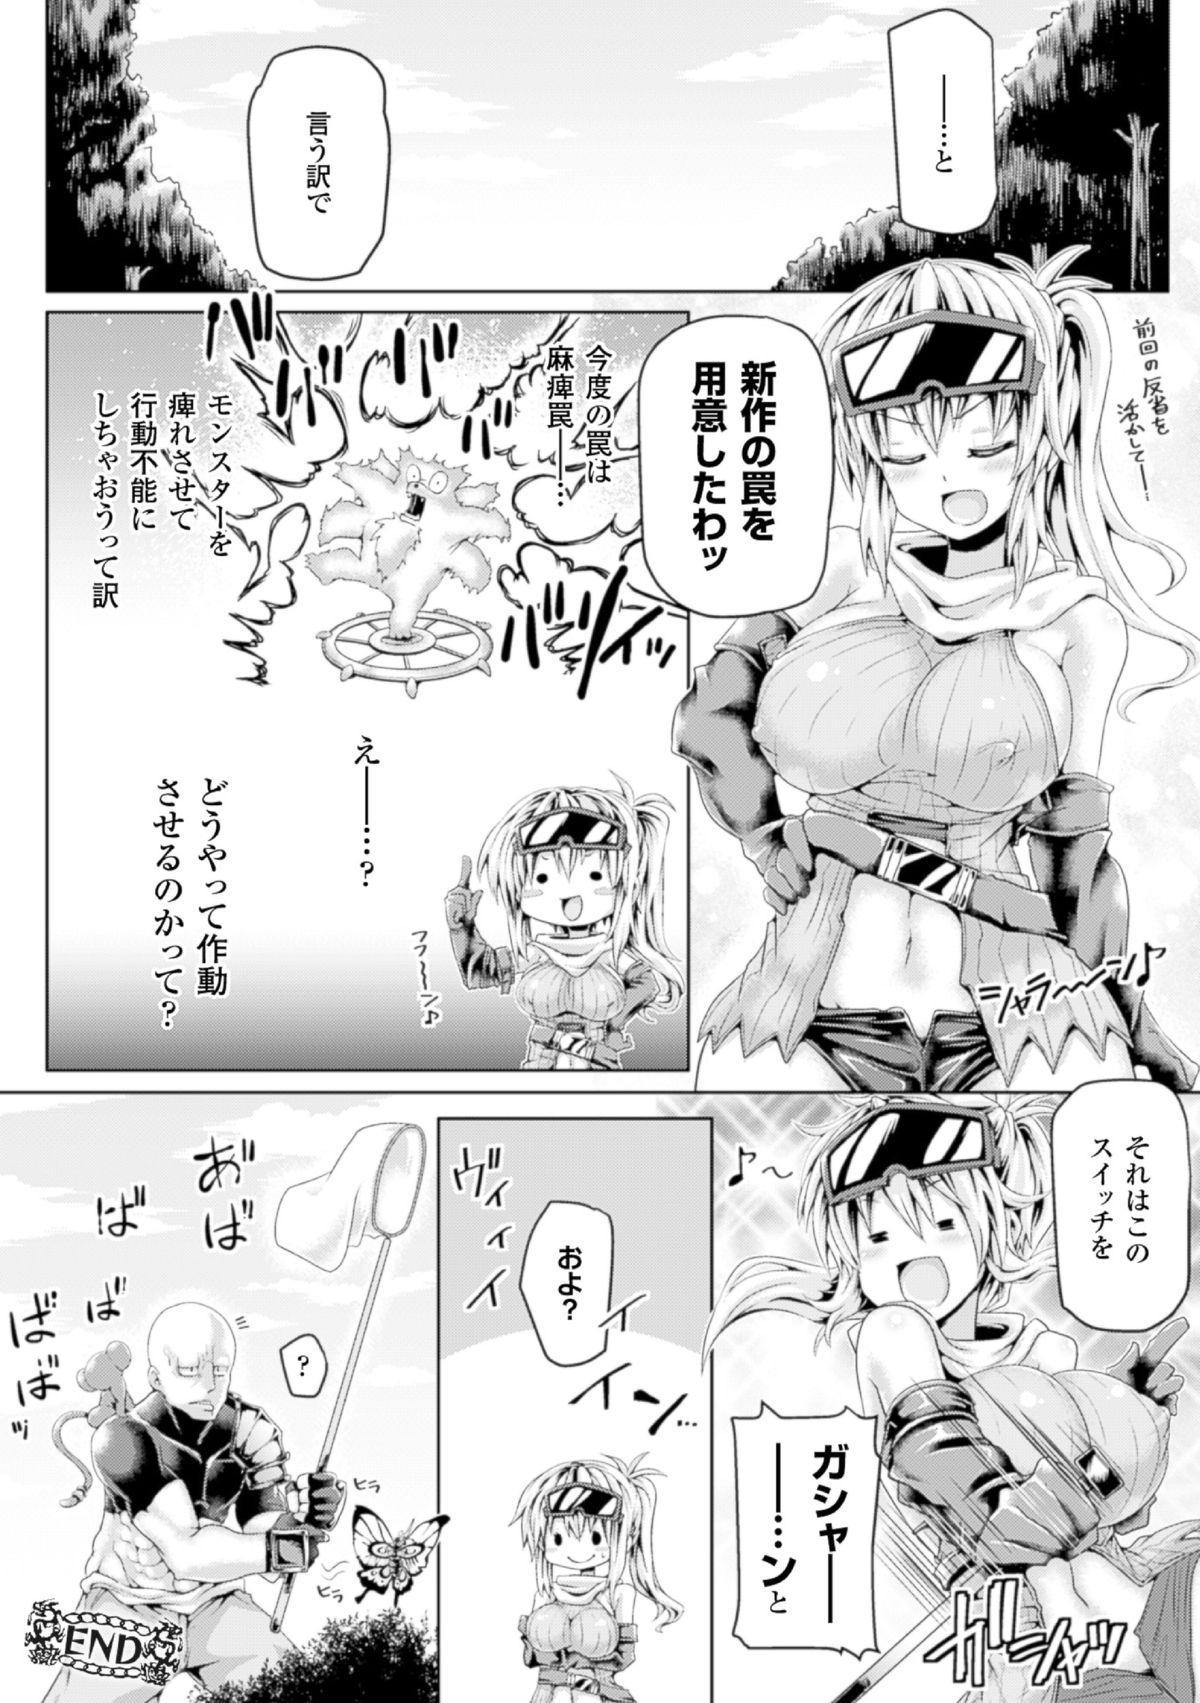 2D Comic Magazine Hunter Heroine AntholoG Vol.1 21